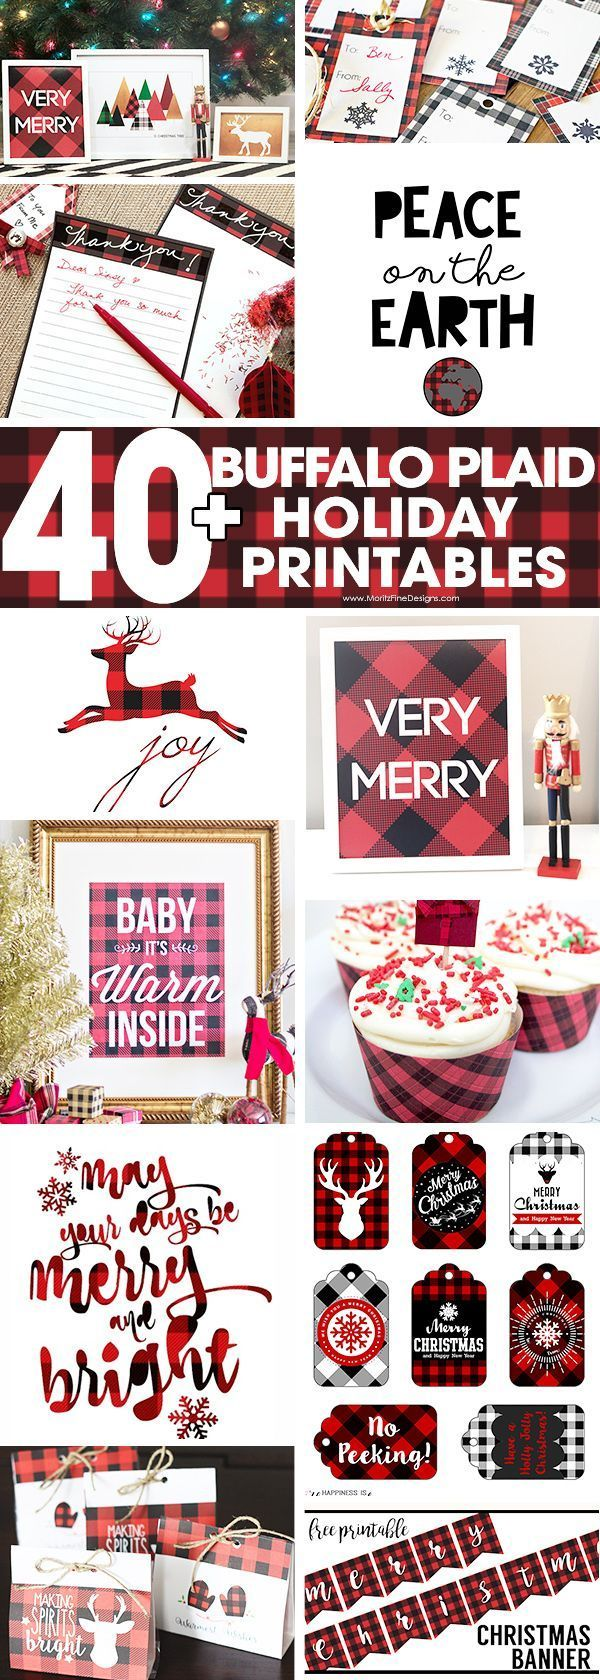 A collection of 40+ Buffalo Check Plaid Free Printables to help you decorate, organize and more for the Christmas Holiday Season. #buffaloplaid #christmas #freeprintables